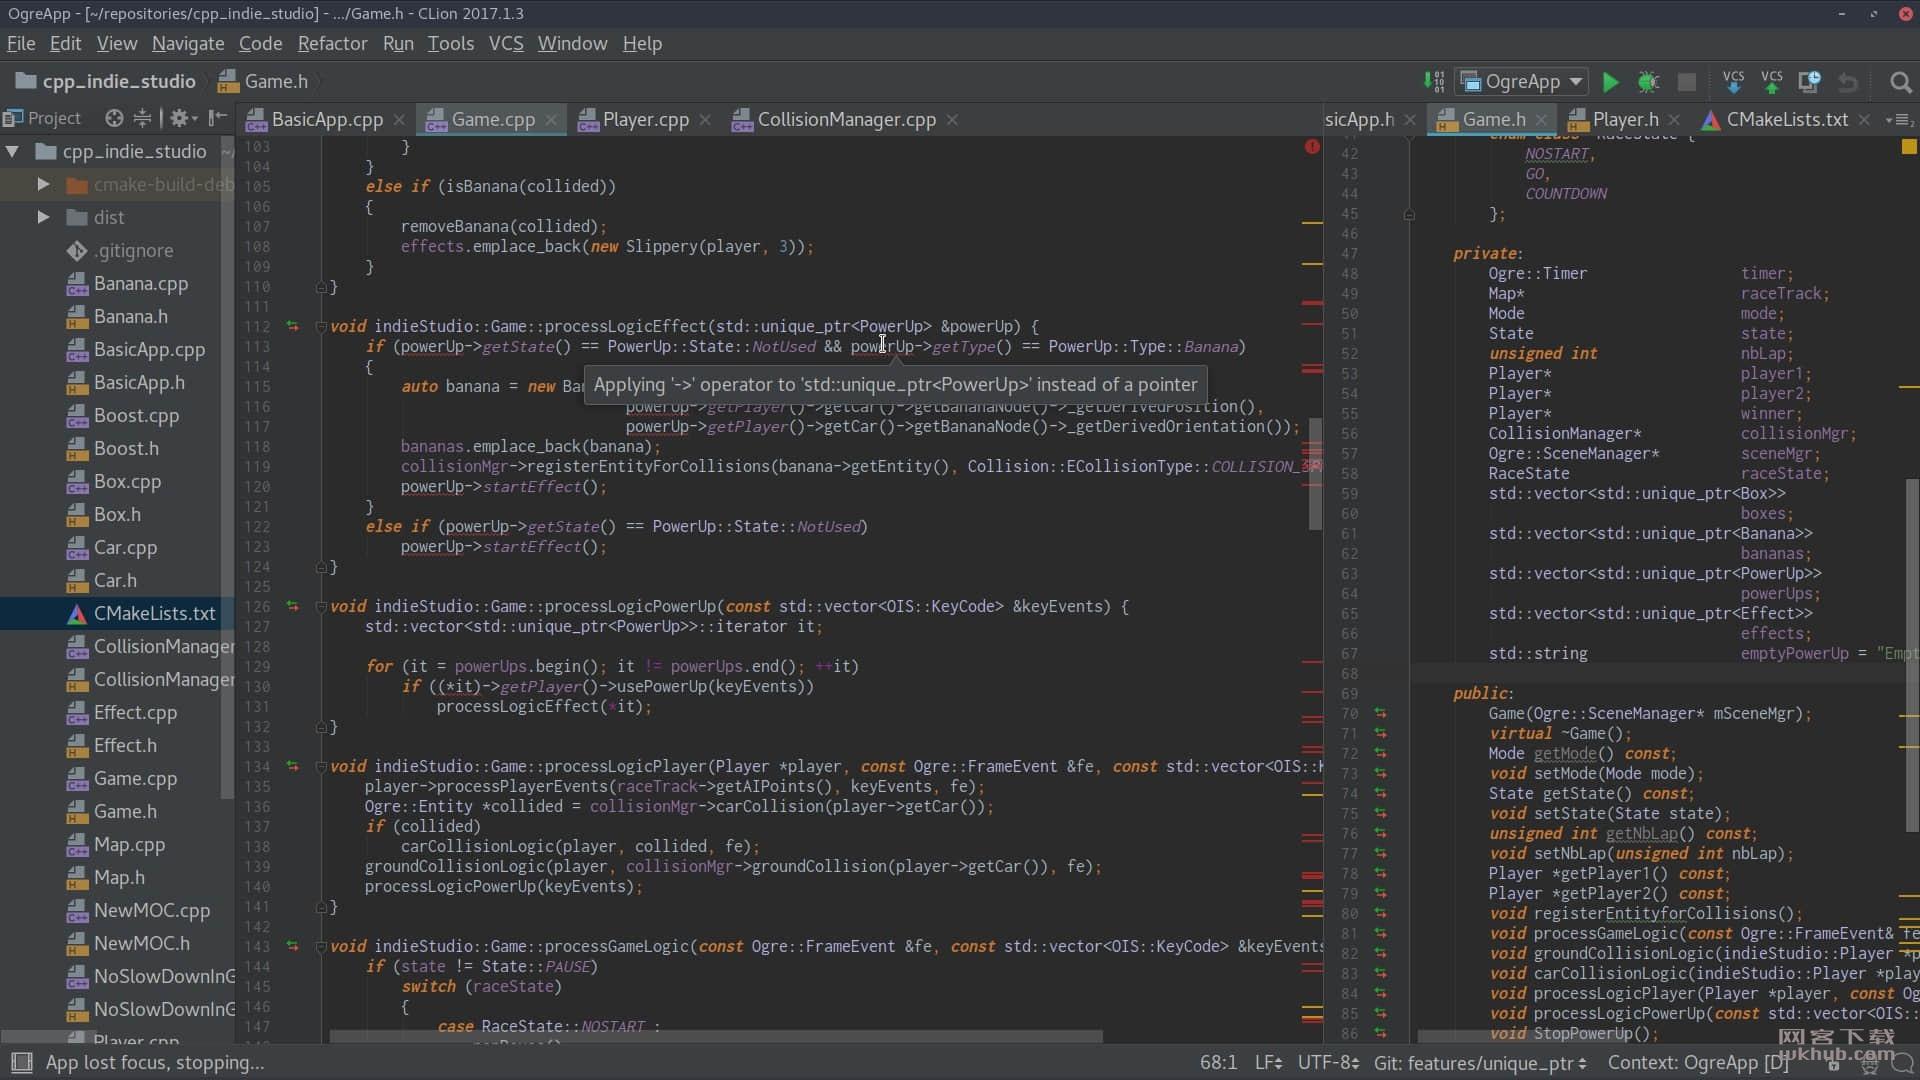 JetBrains CLion 2018.2.6 强大的C/C++开发工具